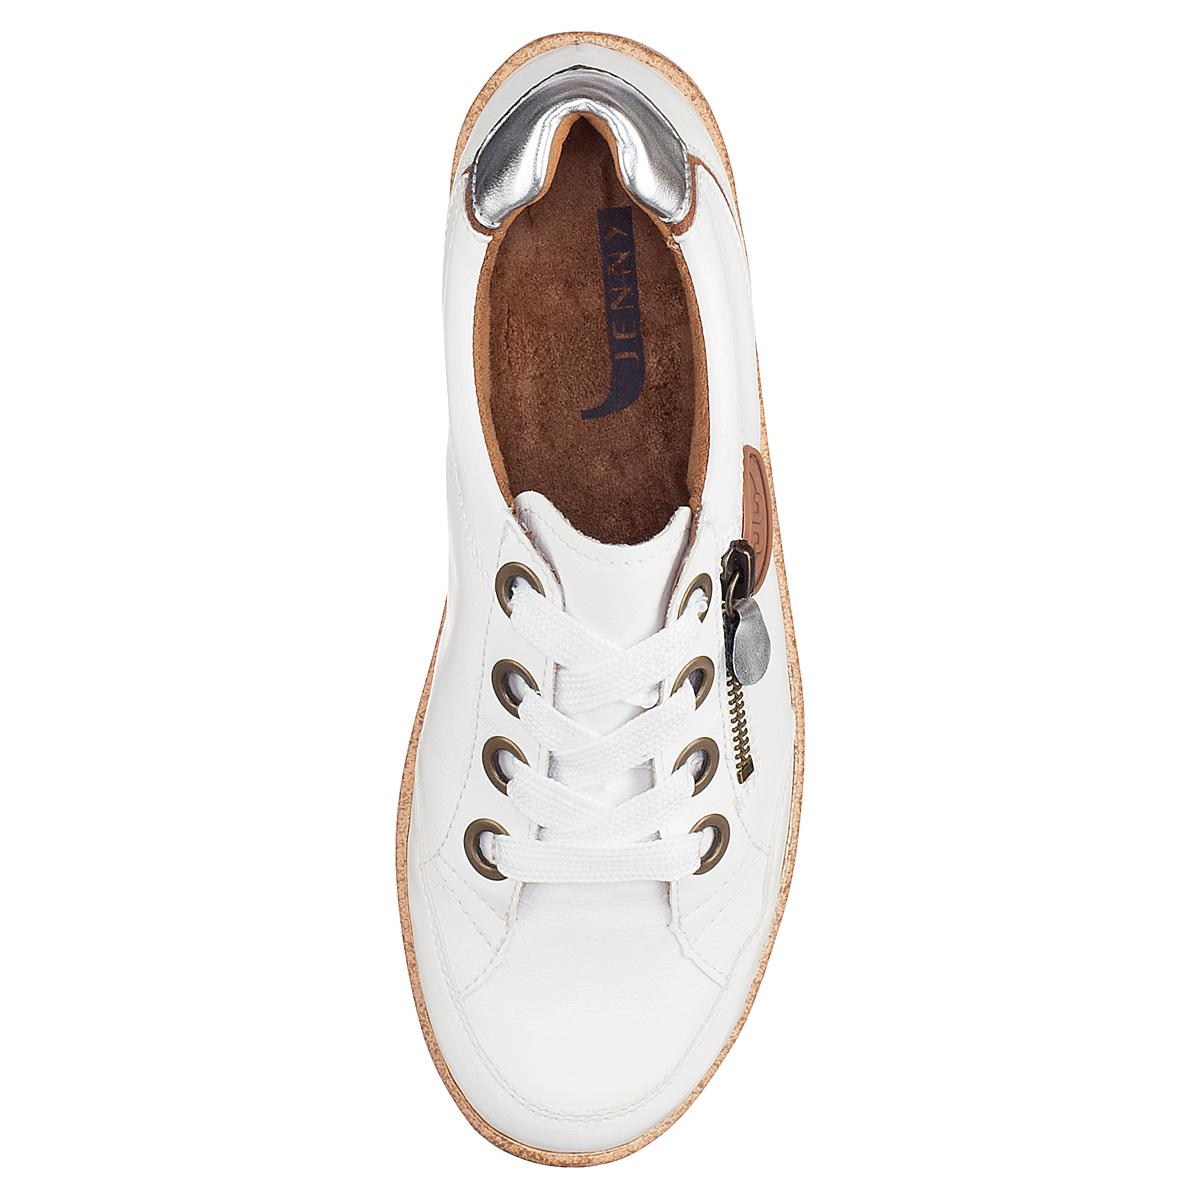 c8eedf45f8 JENNY-GILANG - Ara cipő webáruház